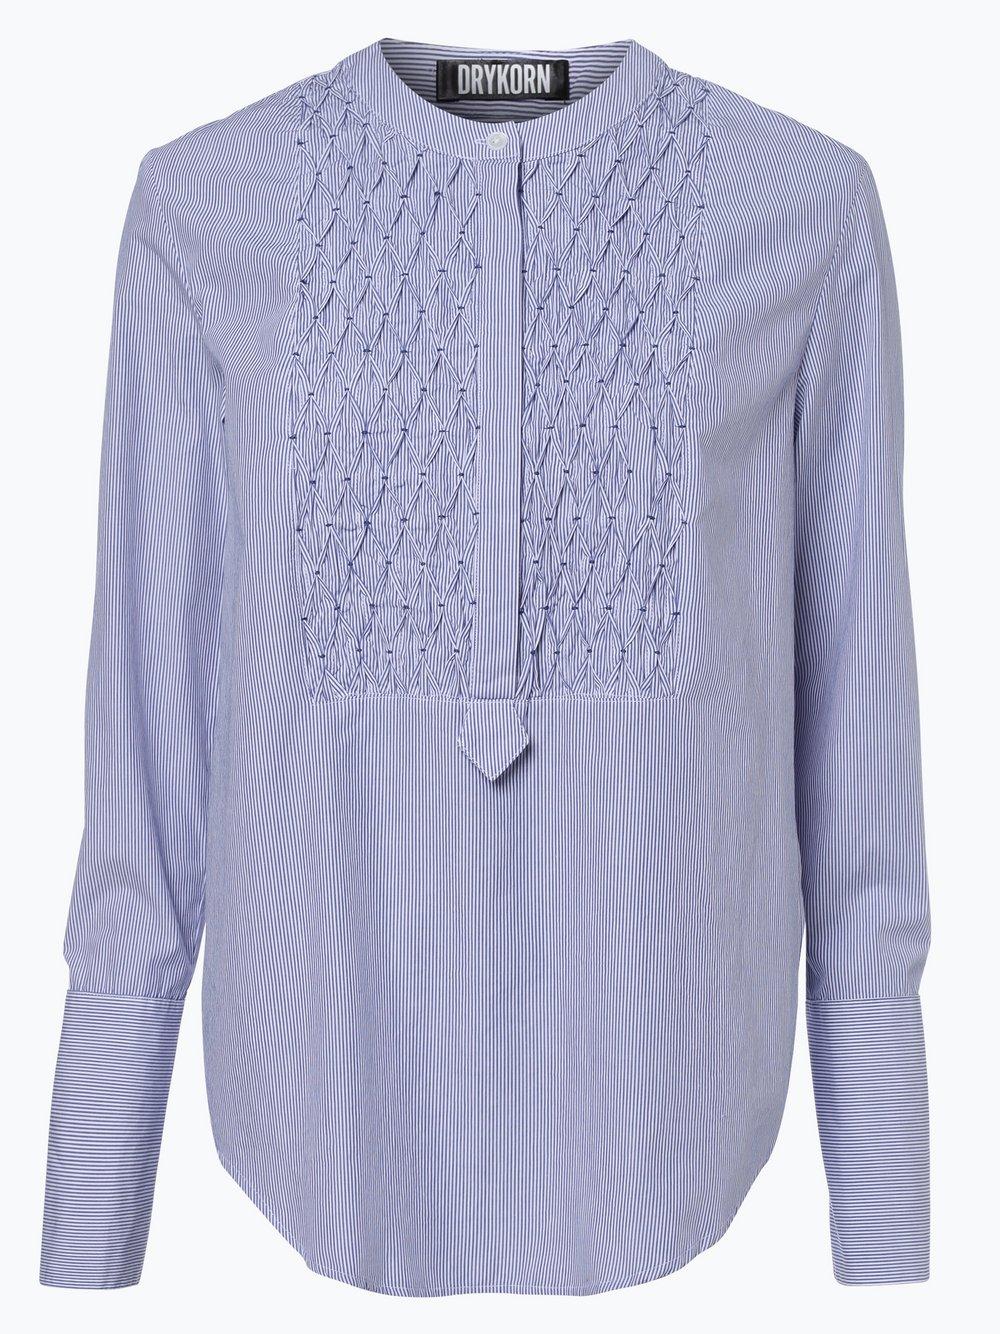 Drykorn Damen Bluse Lin online kaufen | VANGRAAF.COM